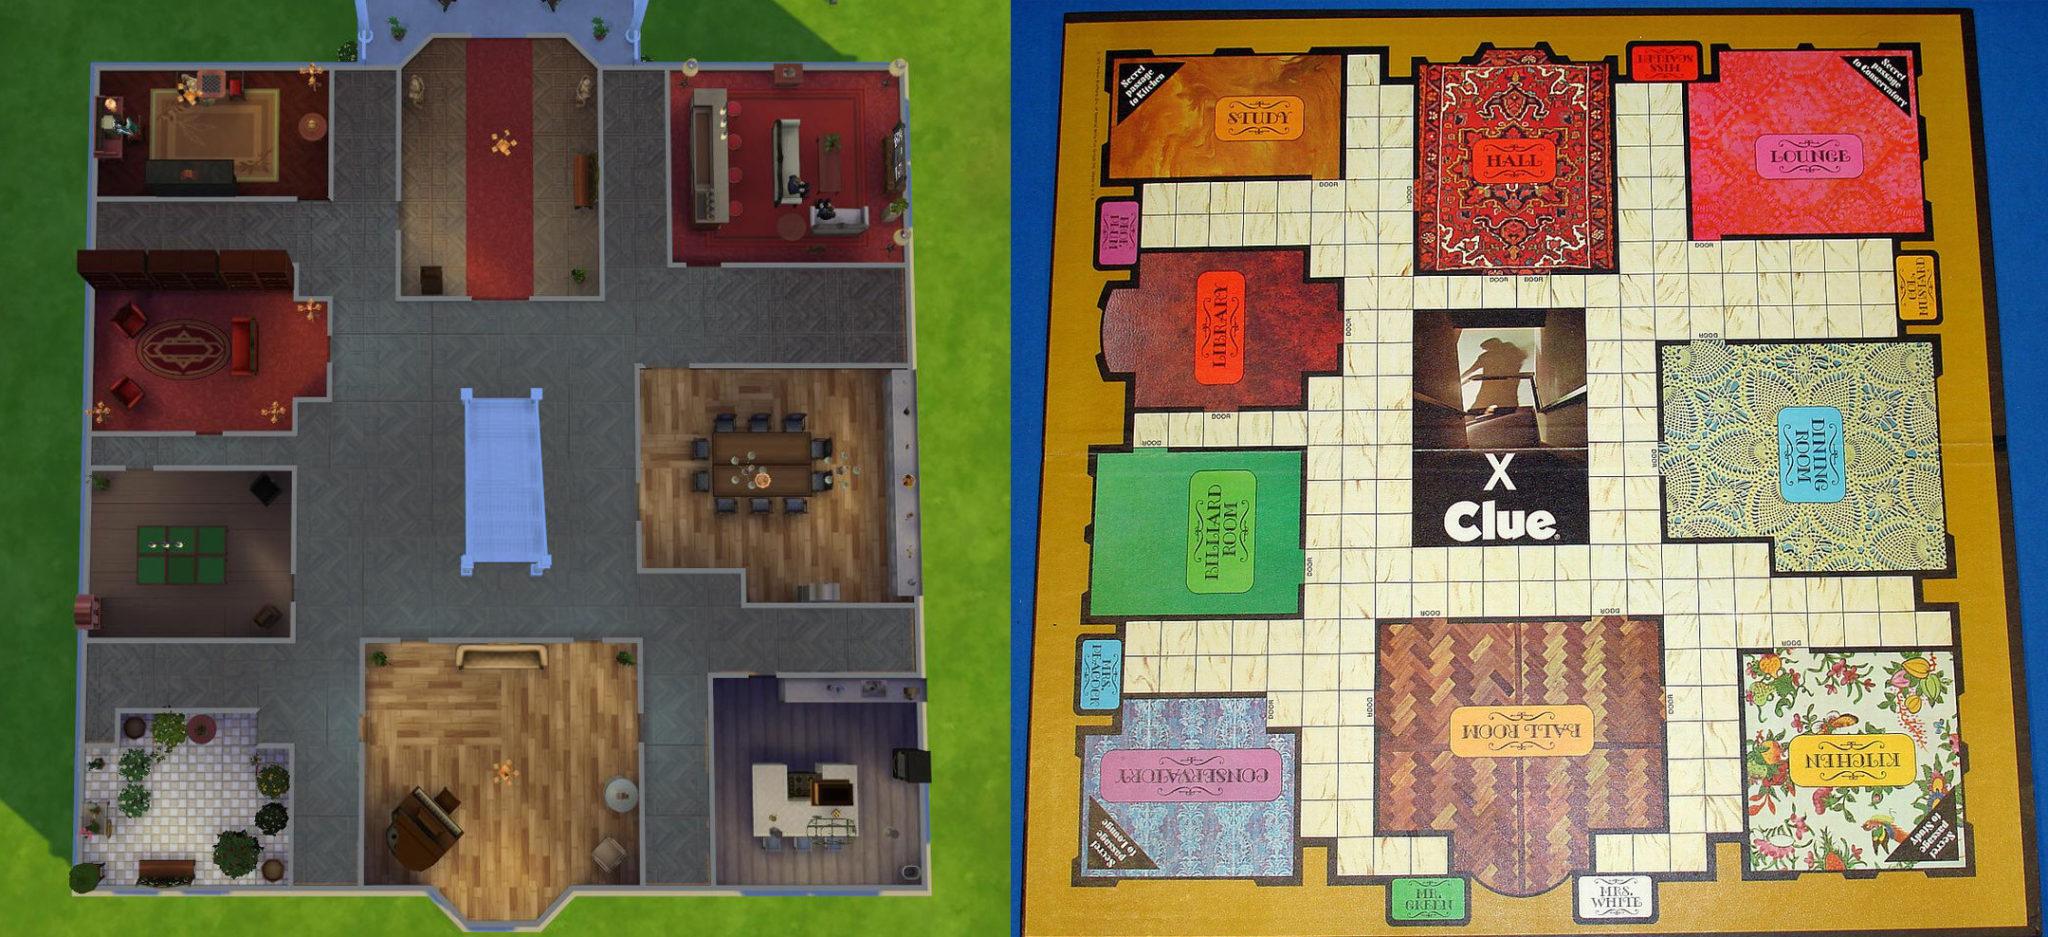 Les Sims 4 - Le manoir de Cluedo - Game-Guide